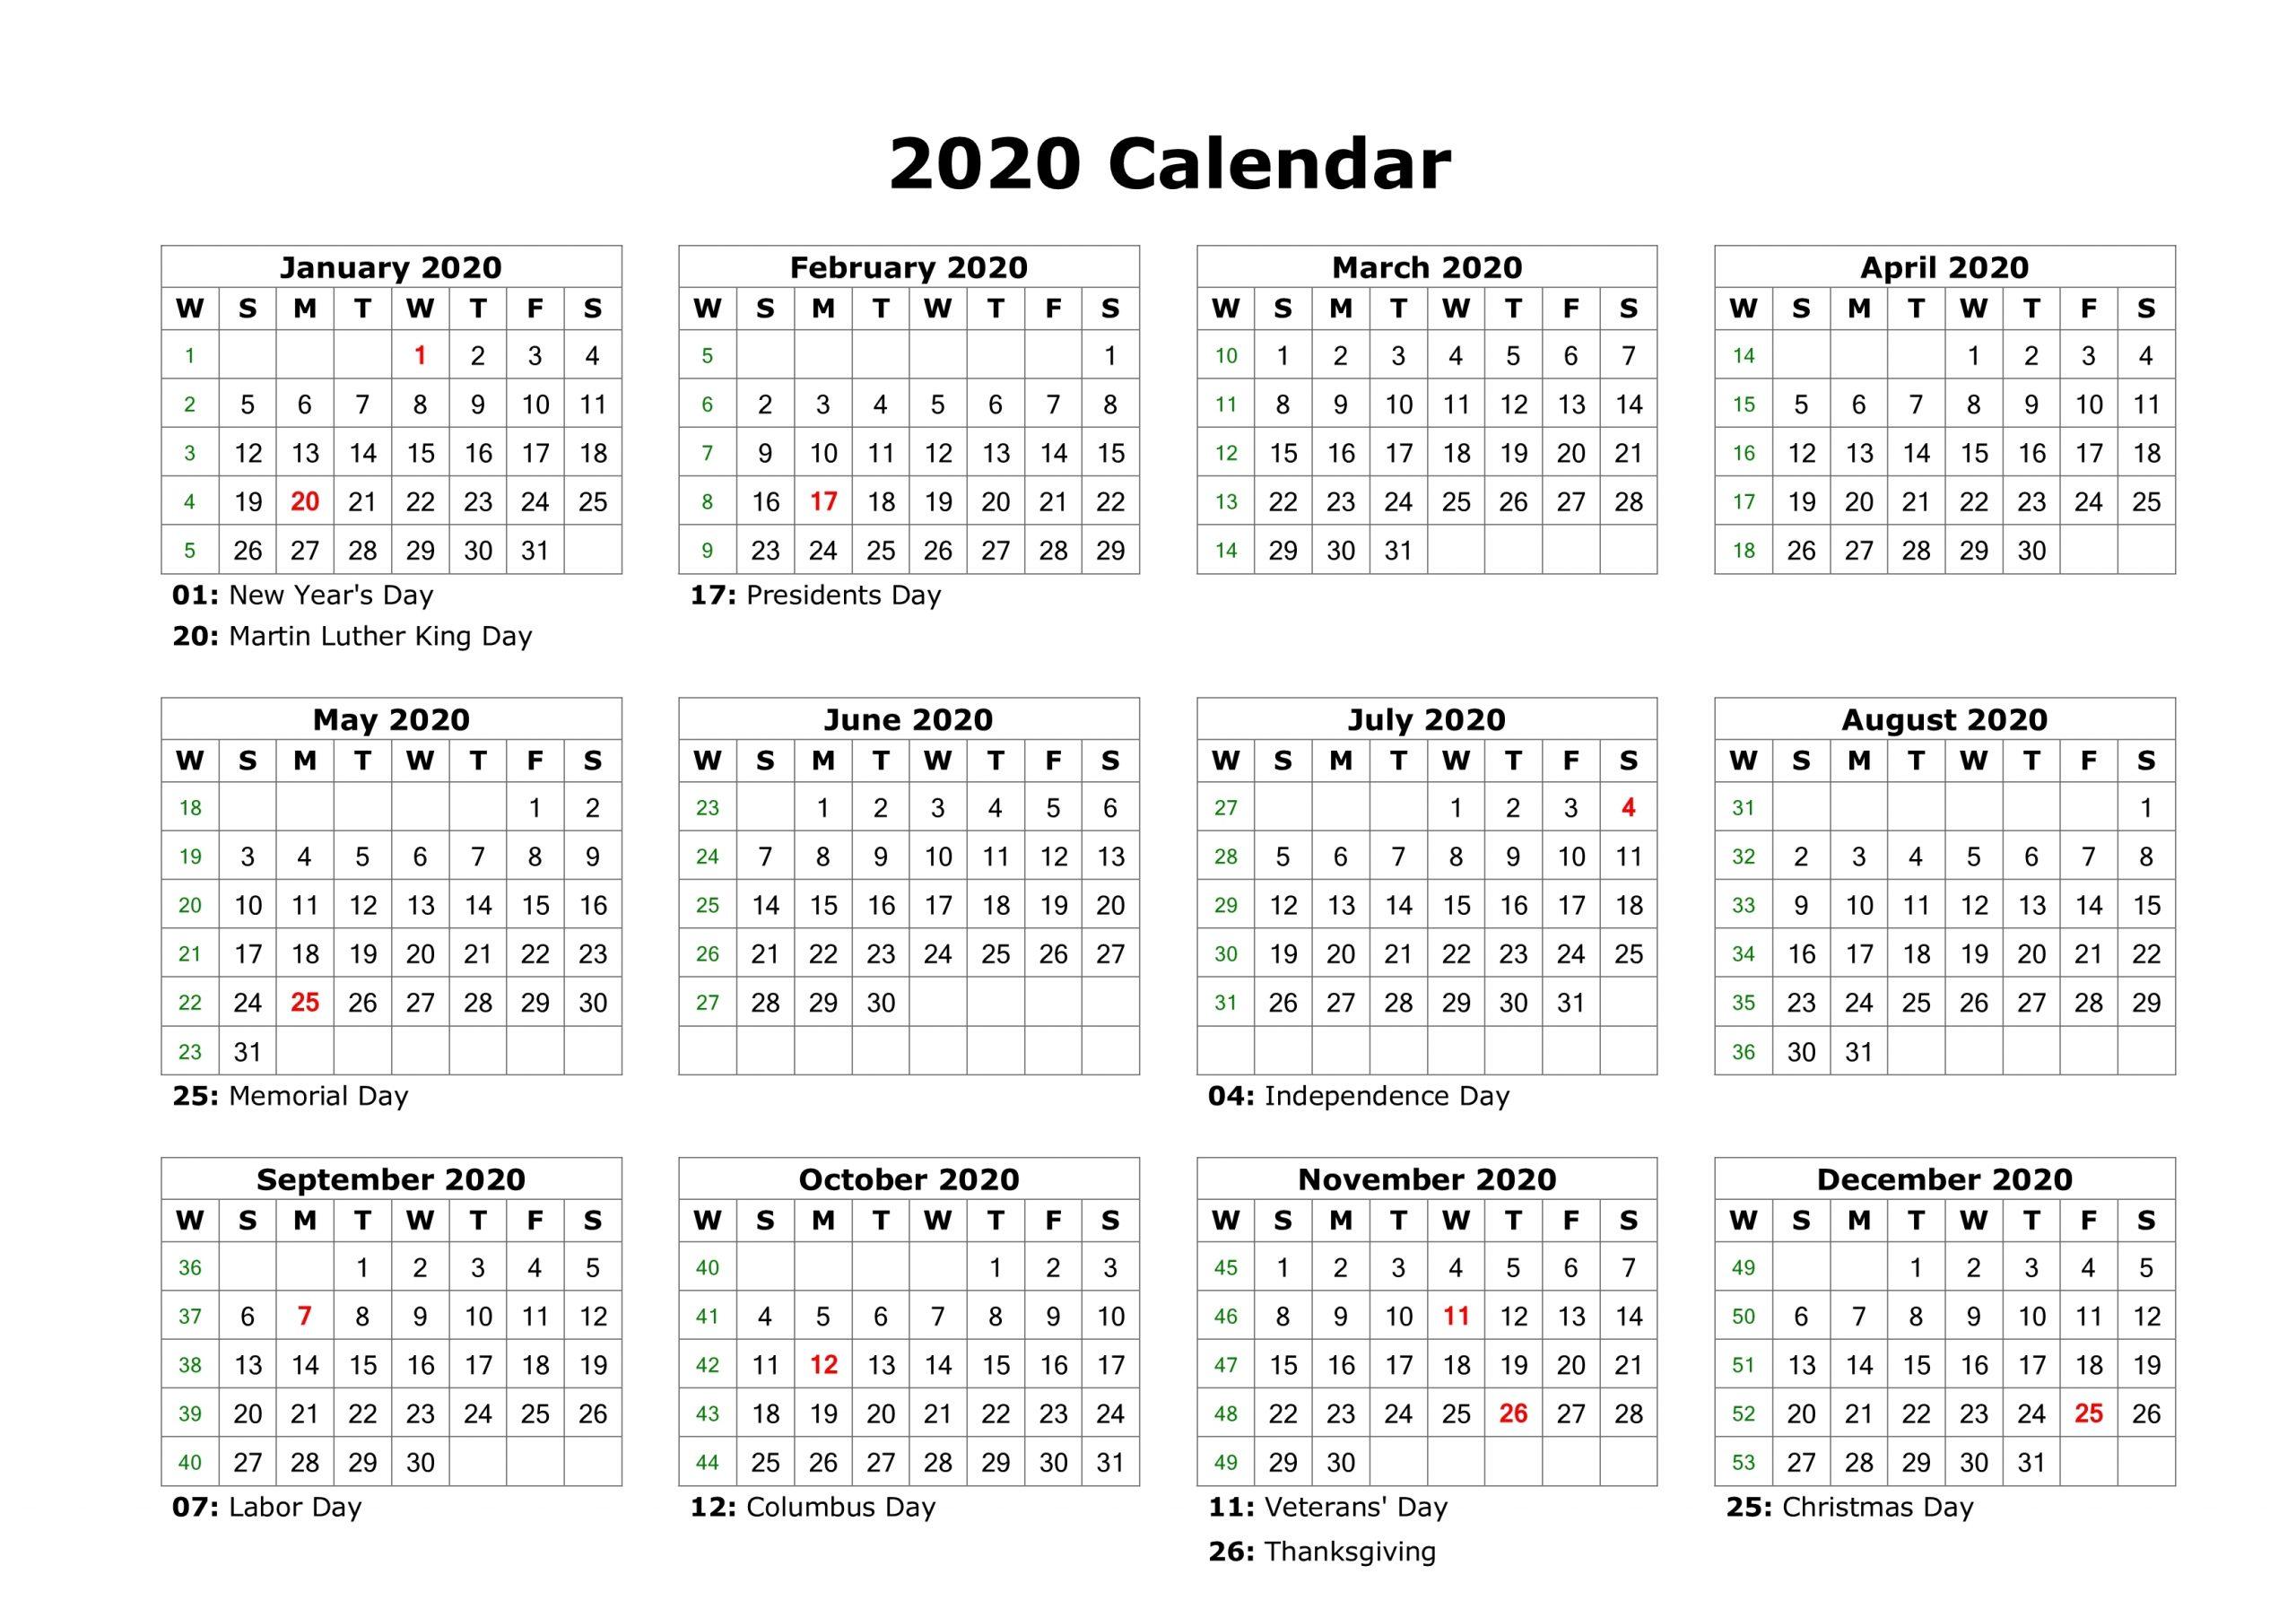 Free Editable 2020 Calendar Printable Template